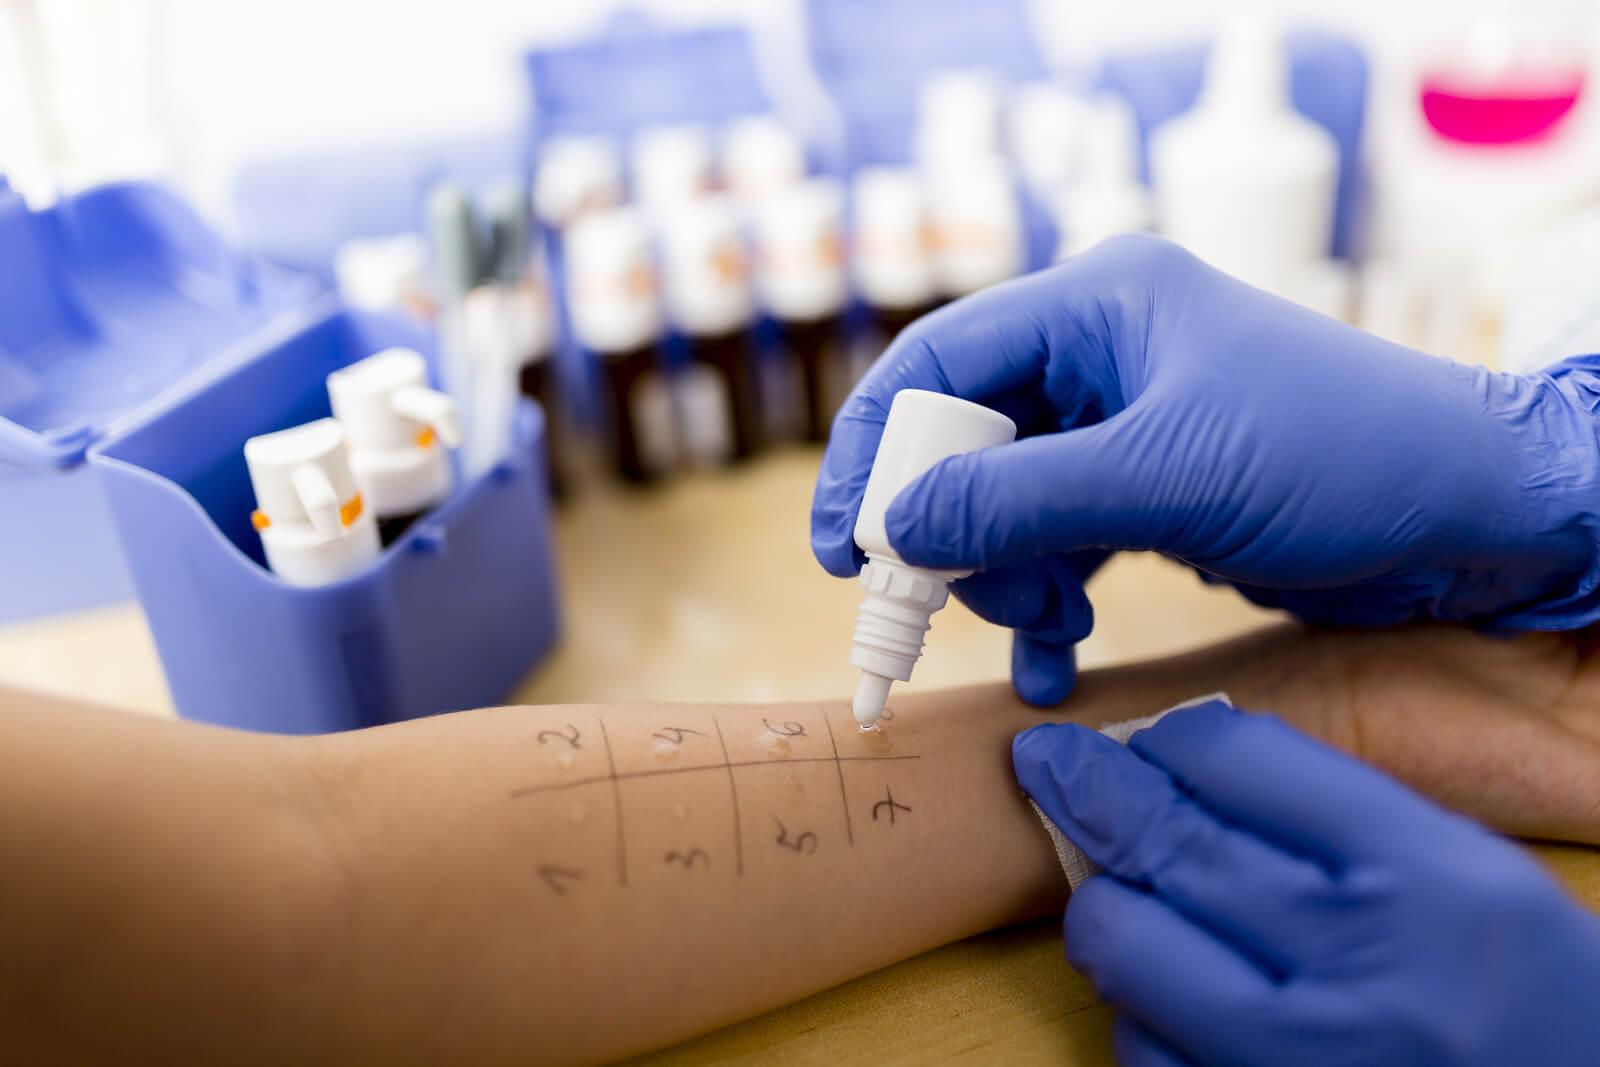 Allergy - skin prick tests